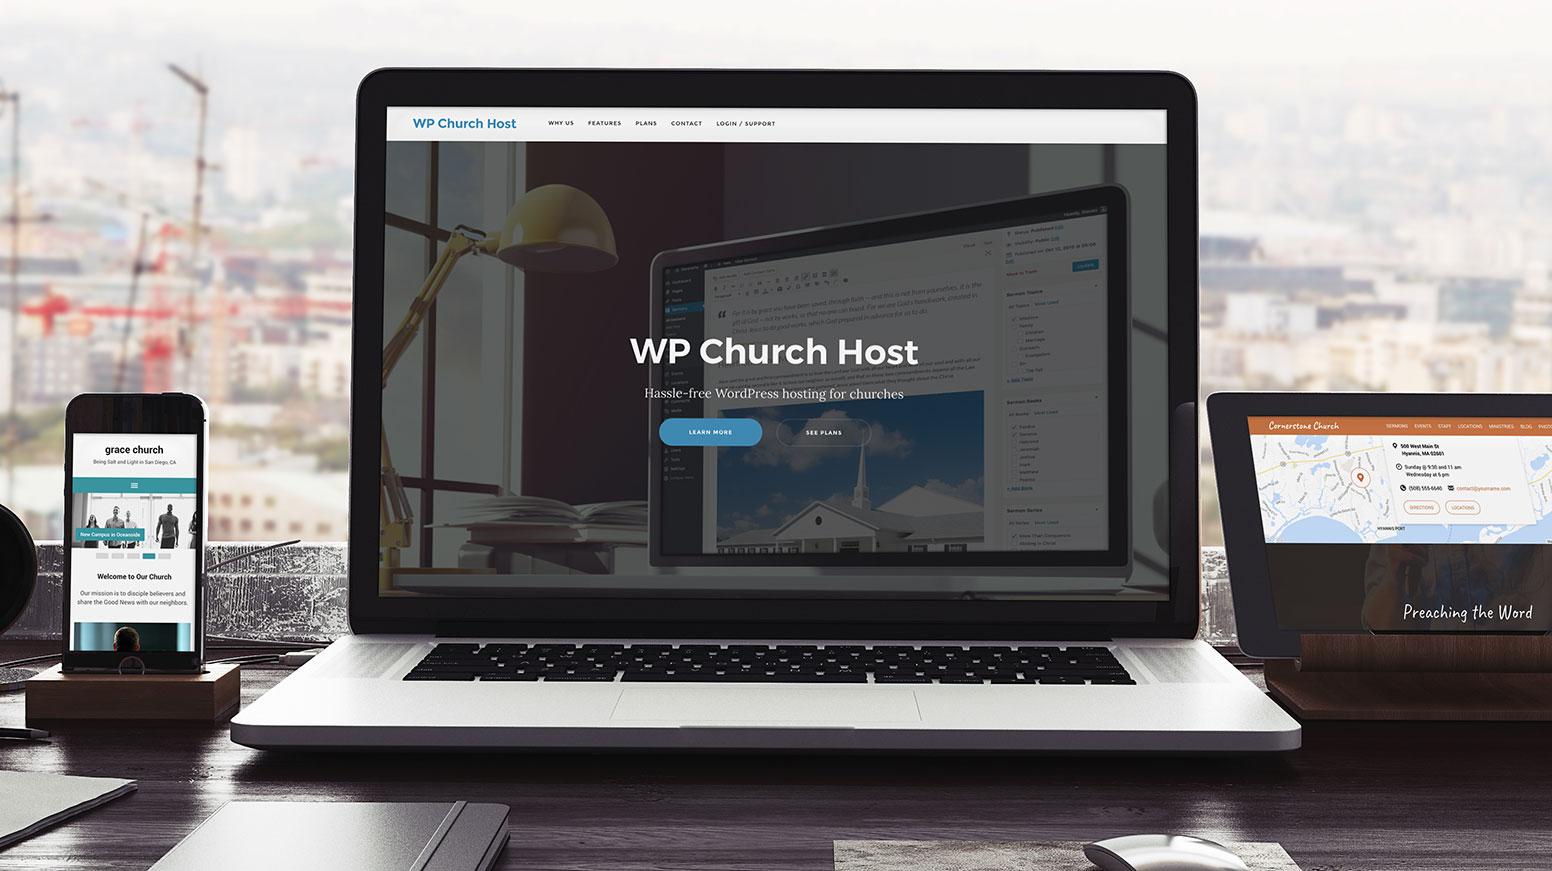 WP Church Host Desk